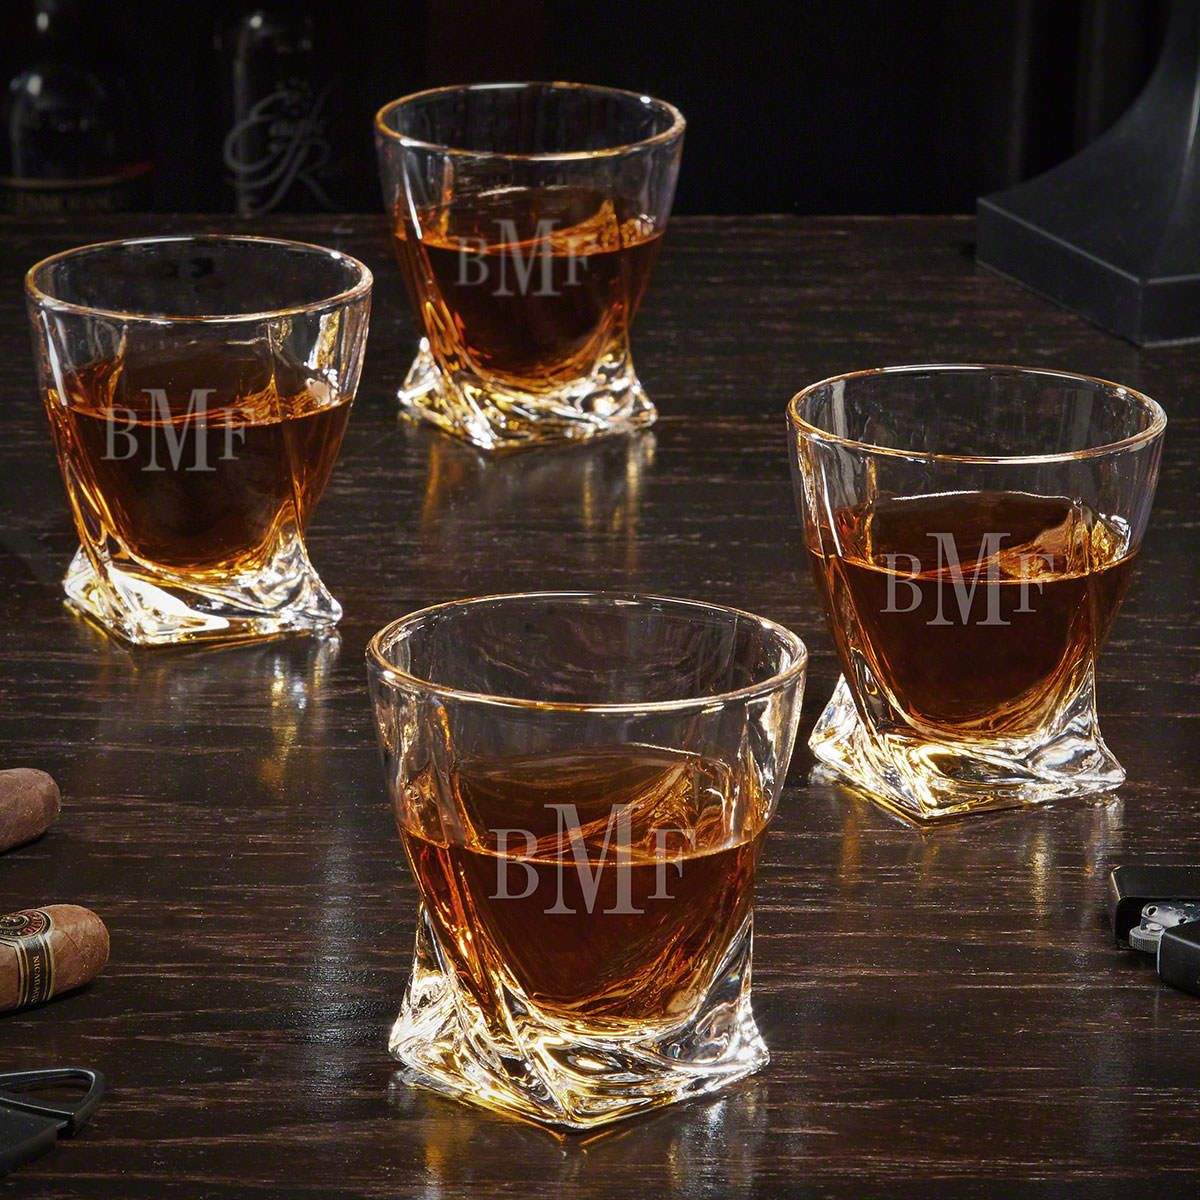 Classic Monogram Set of 4 Twist Personalized Whiskey Glasses